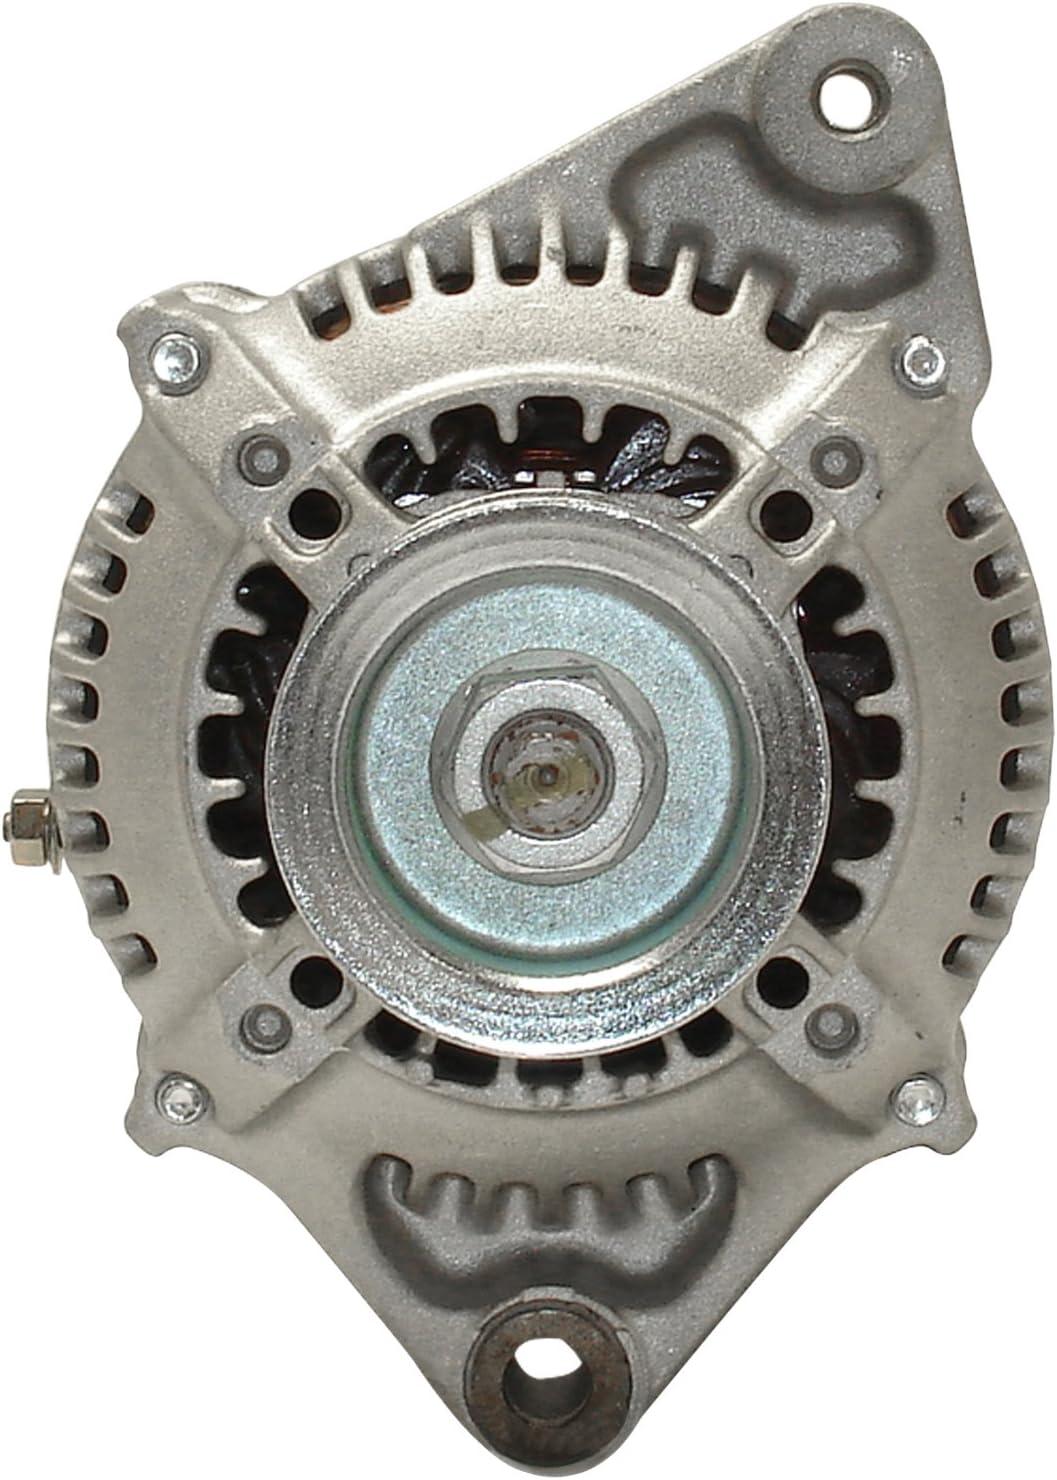 safety Quality-Built Max 58% OFF 14611 Premium Remanufactured - Alternator